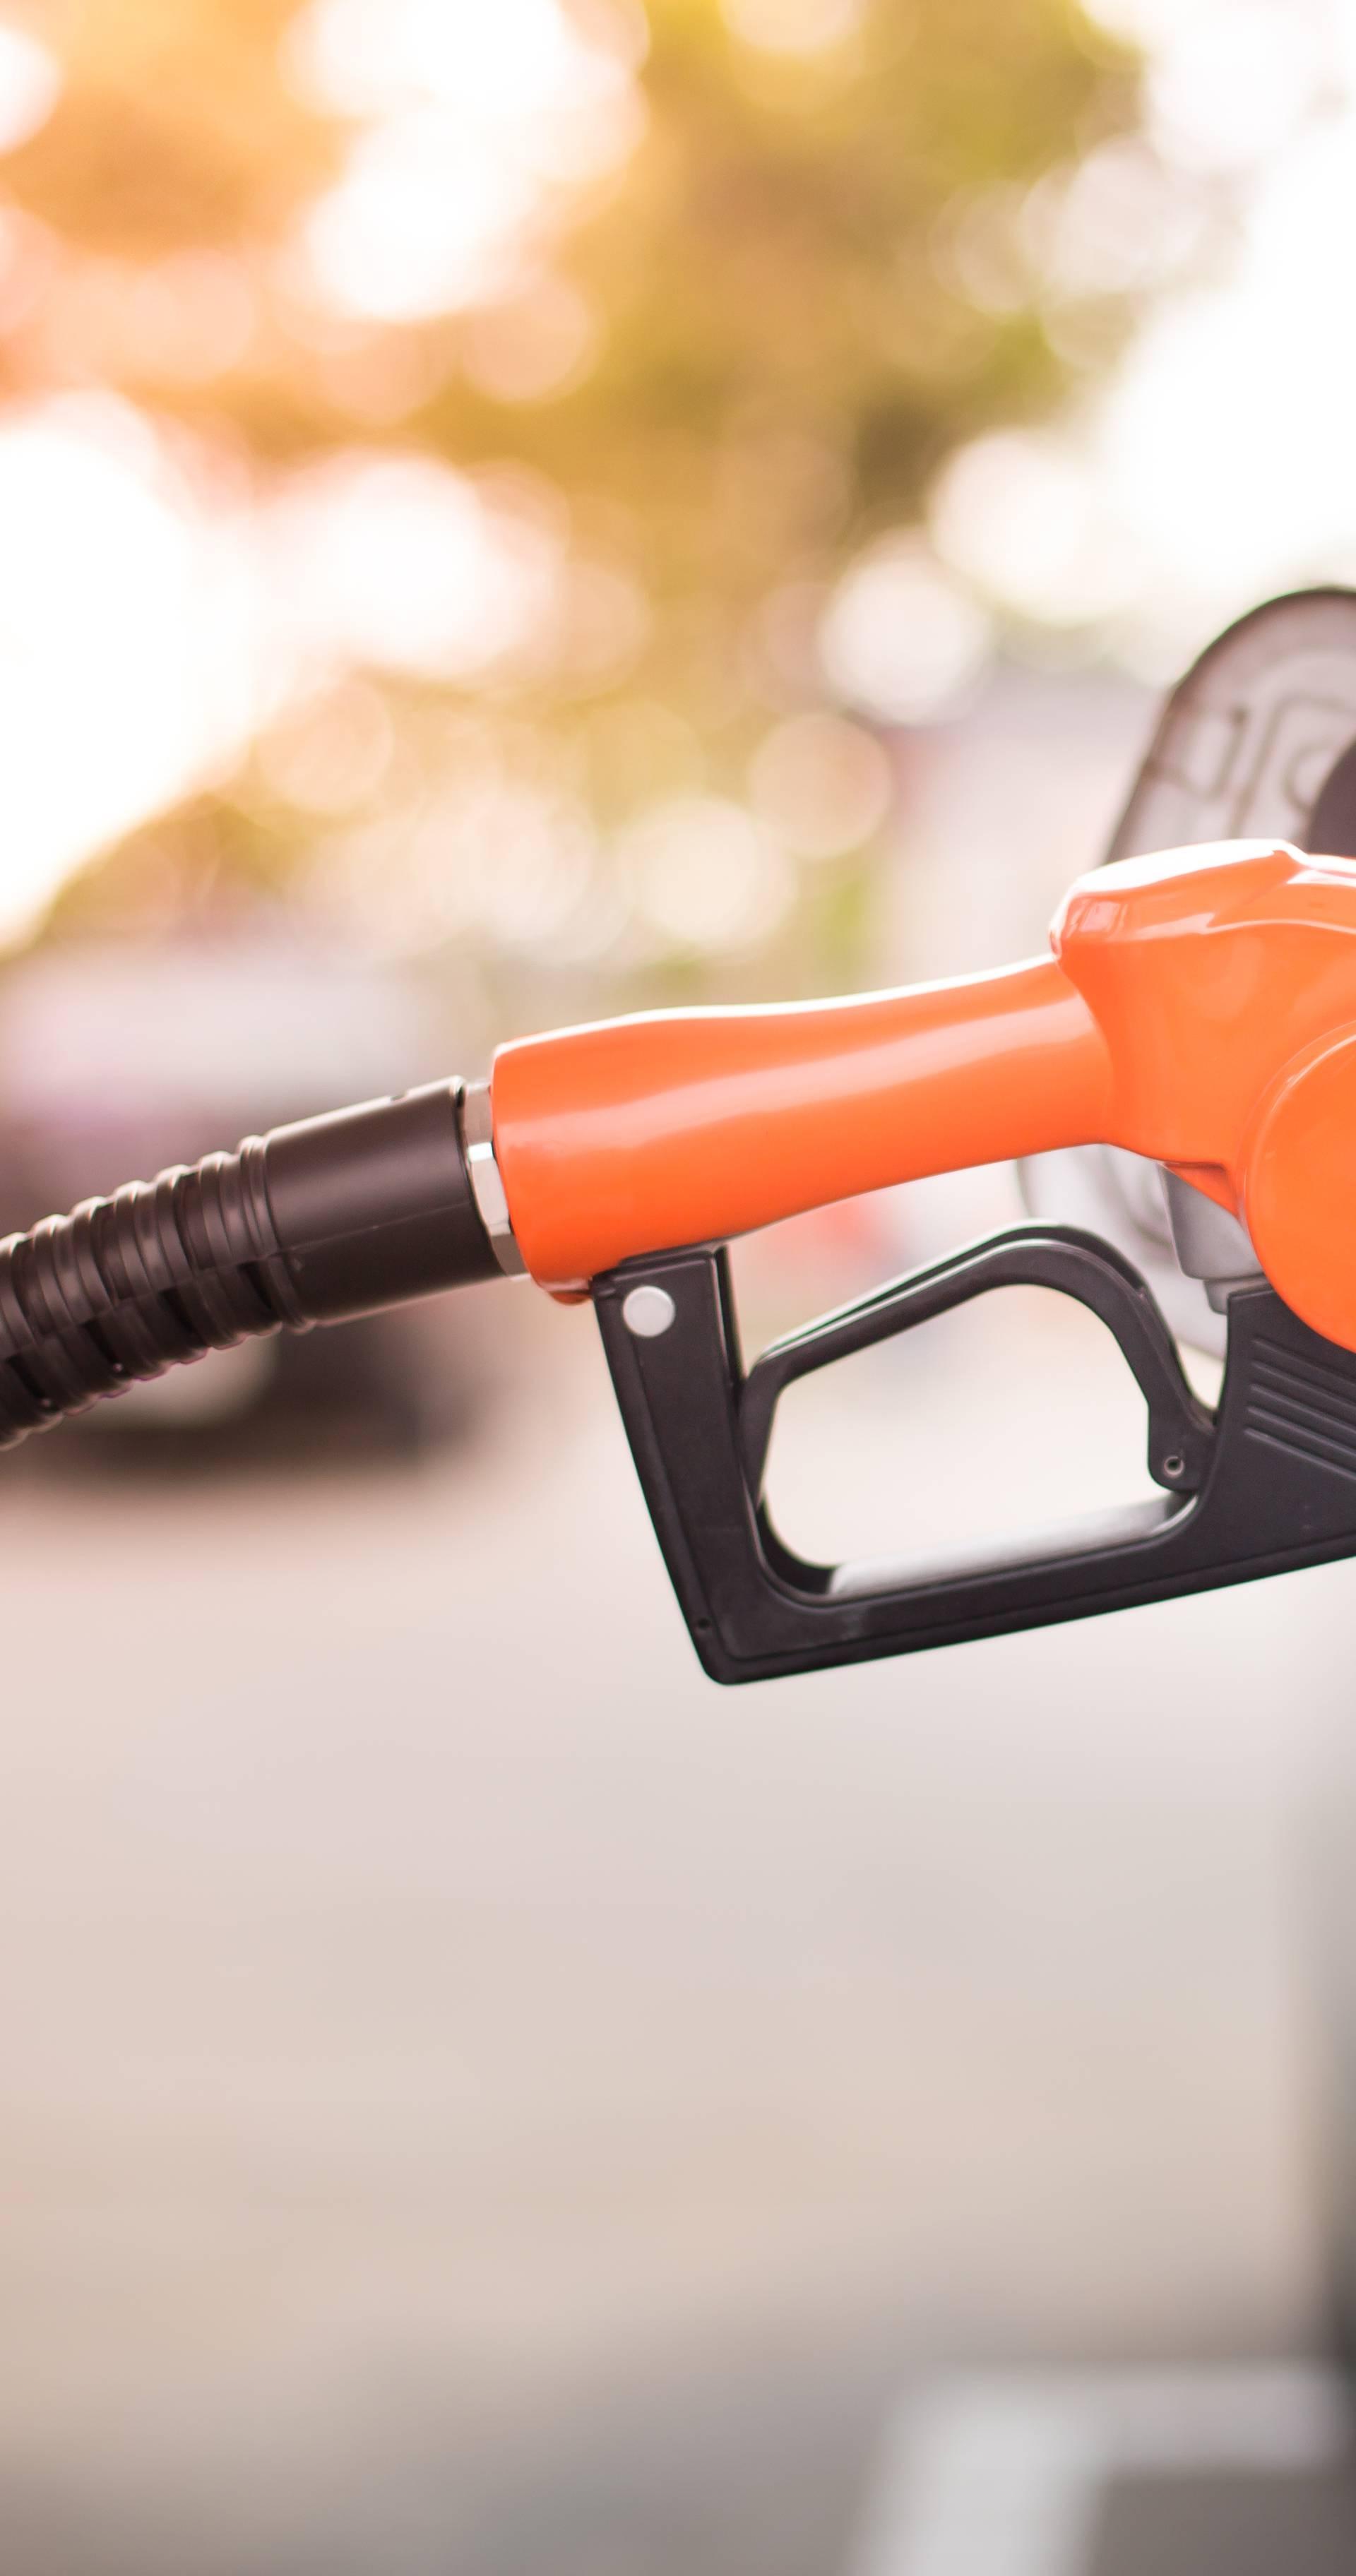 Pravila nagradne igre: Osvoji 5000 kuna goriva i pretplatu na 24sata